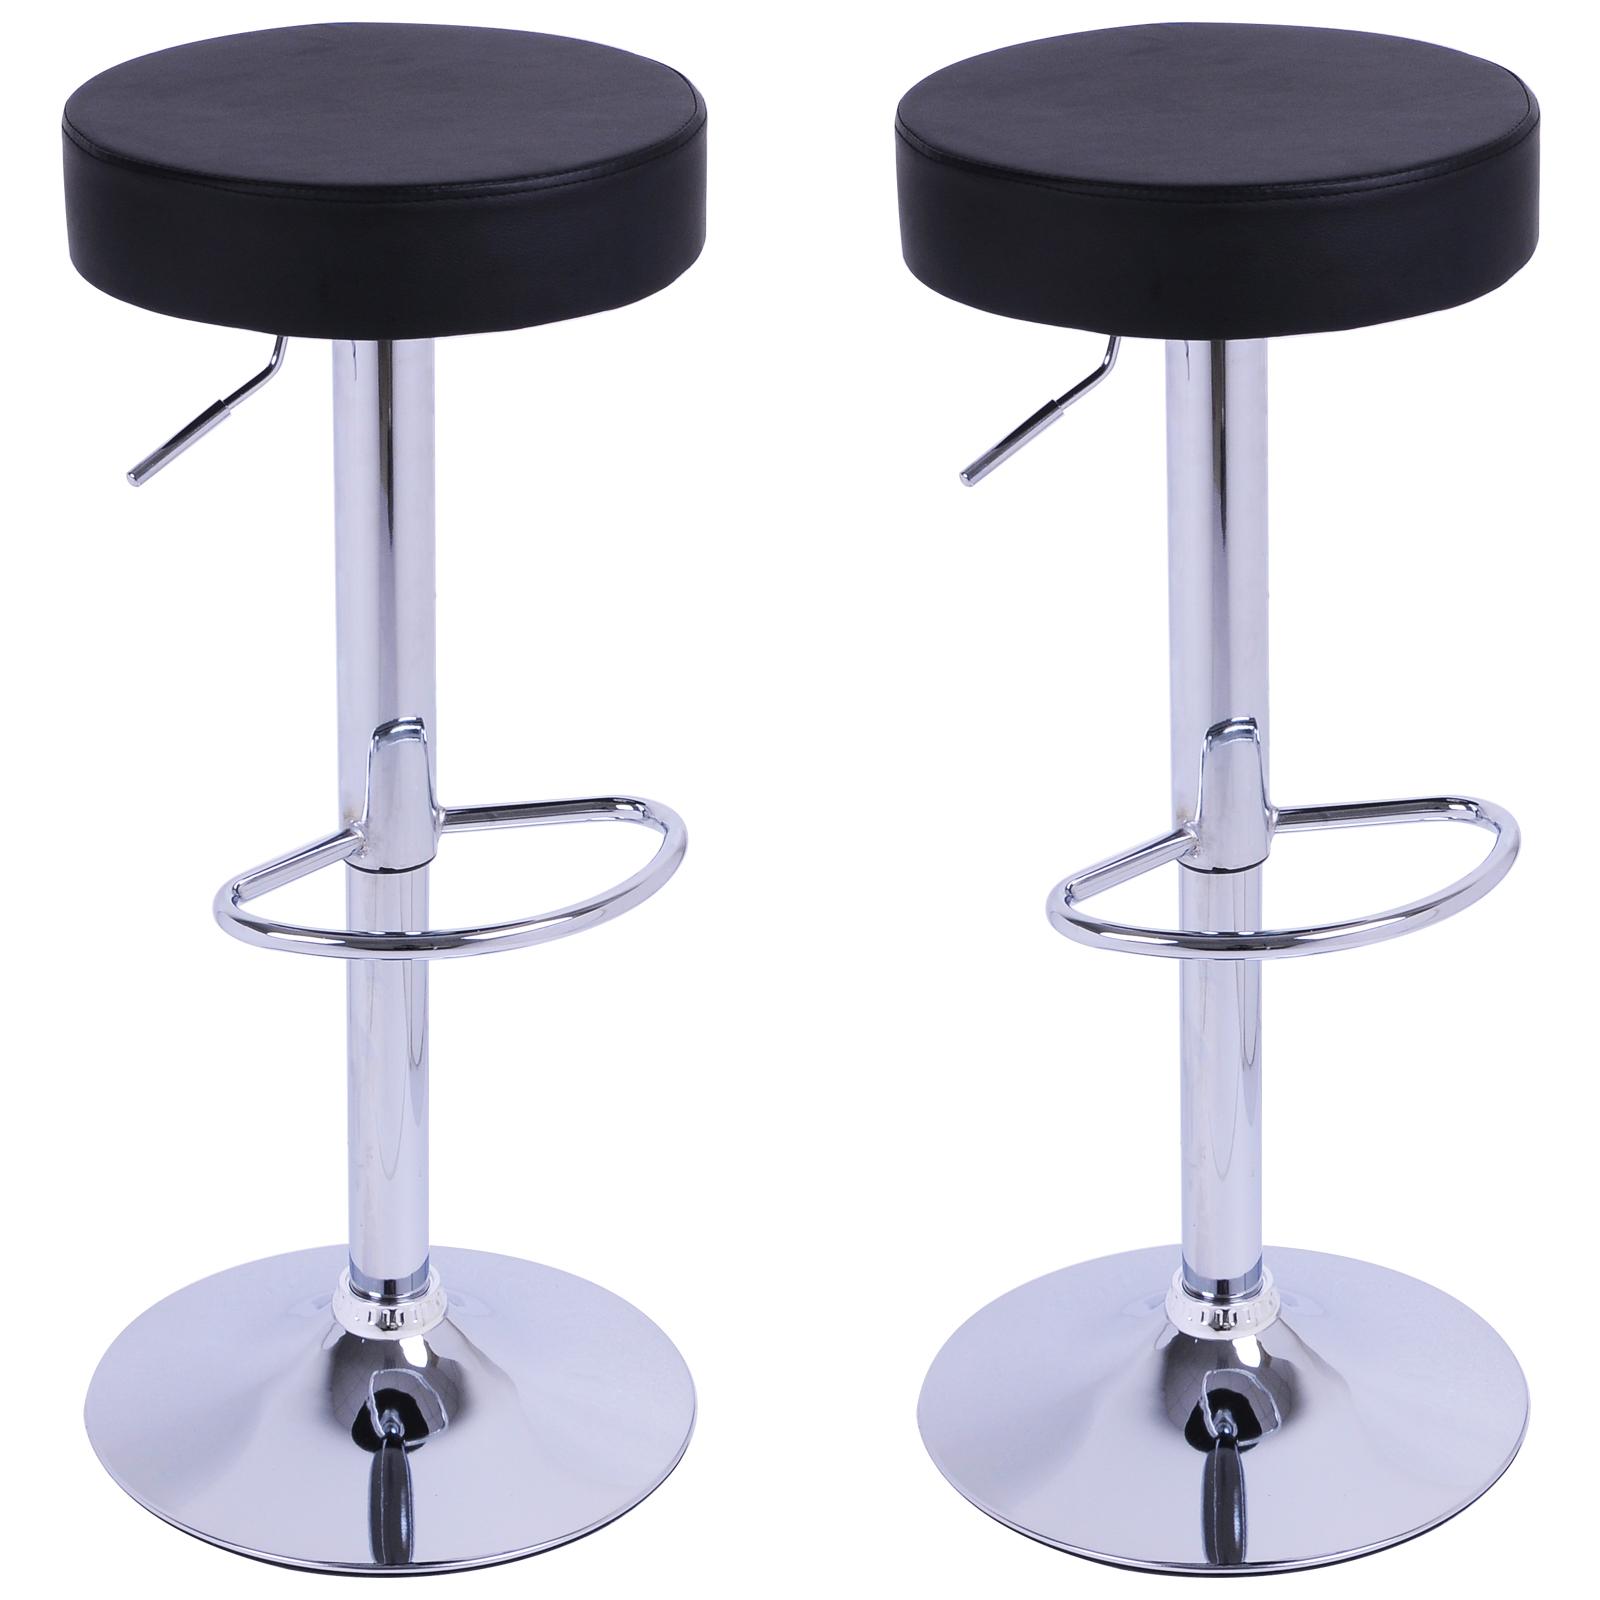 2 x barhocker tresenhocker kunstleder barstuhl bar hocker. Black Bedroom Furniture Sets. Home Design Ideas